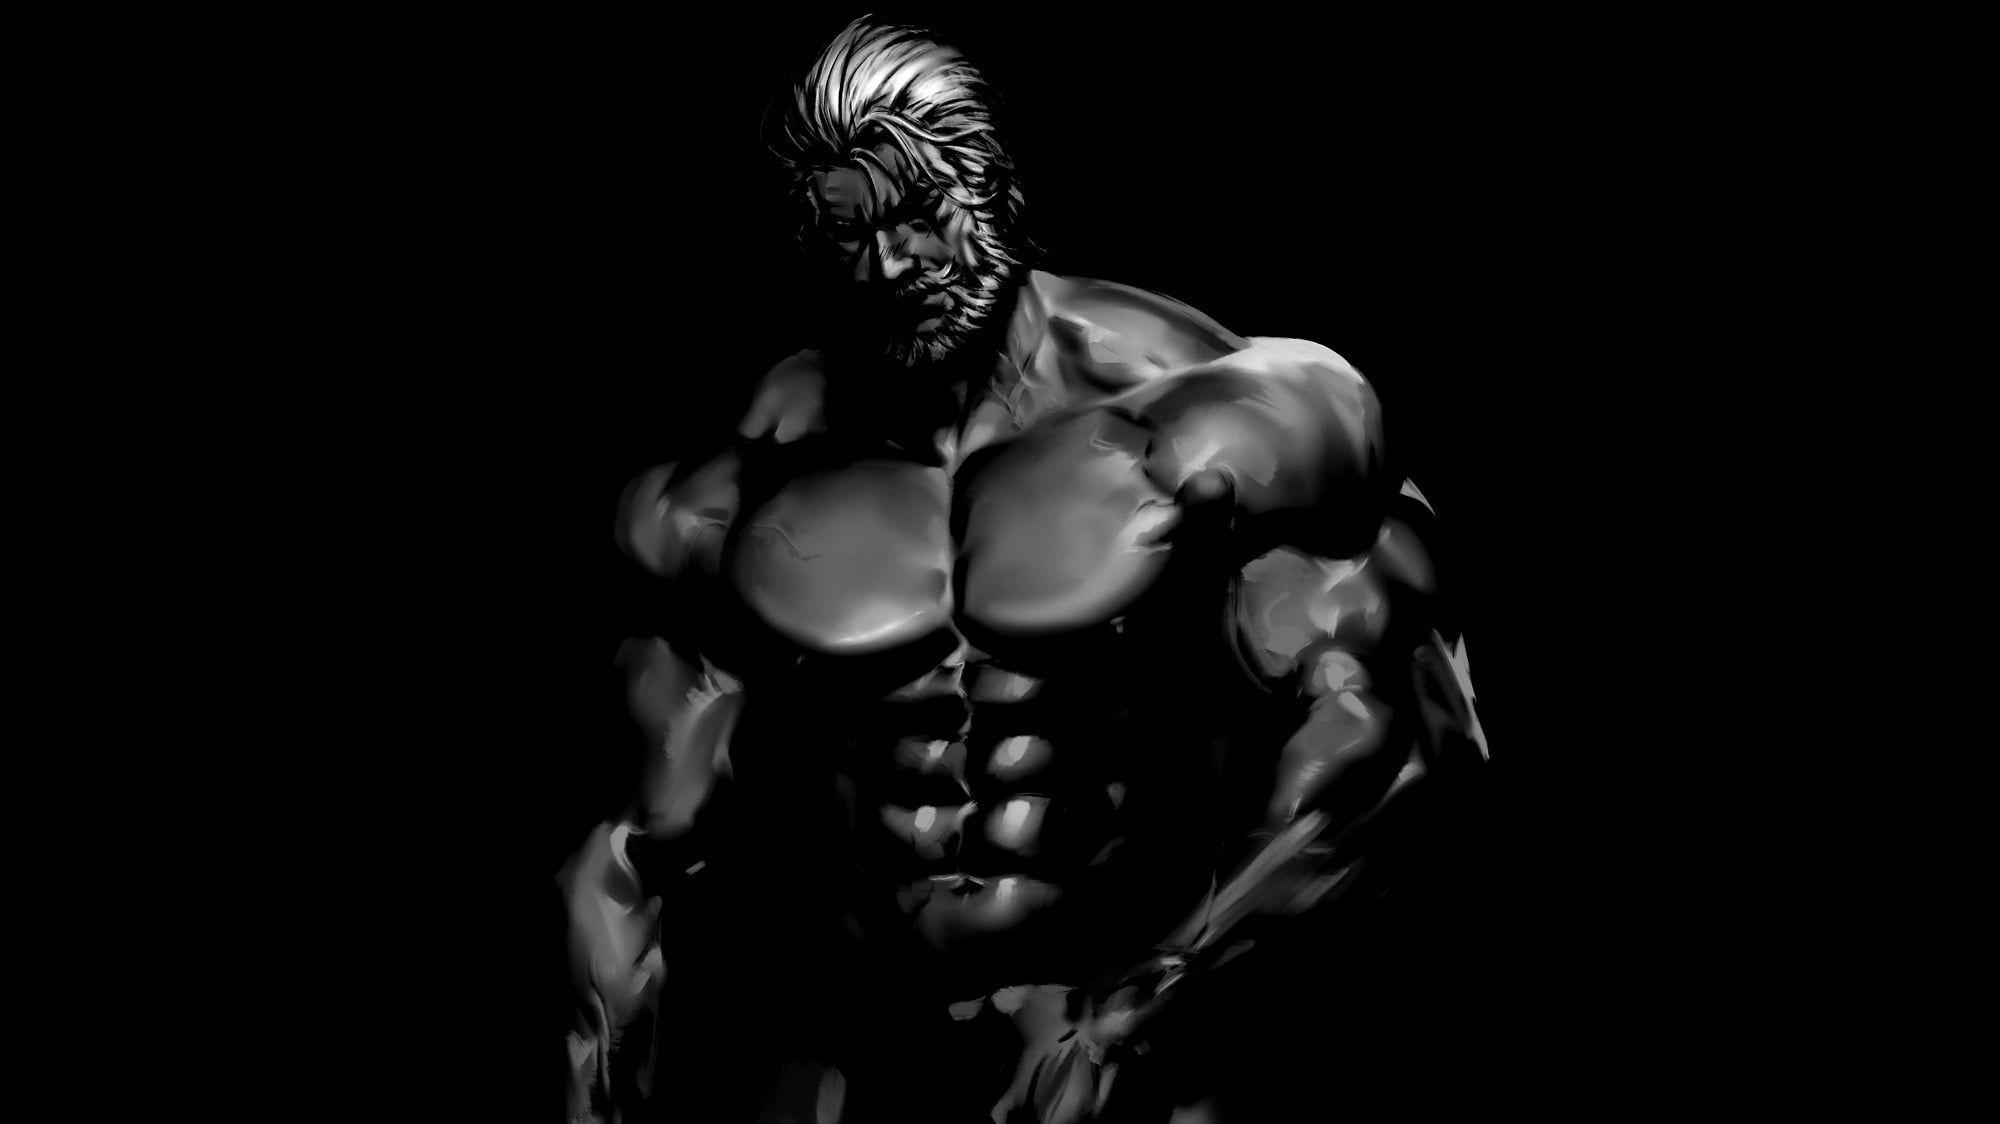 Wallpaper bodybuilder